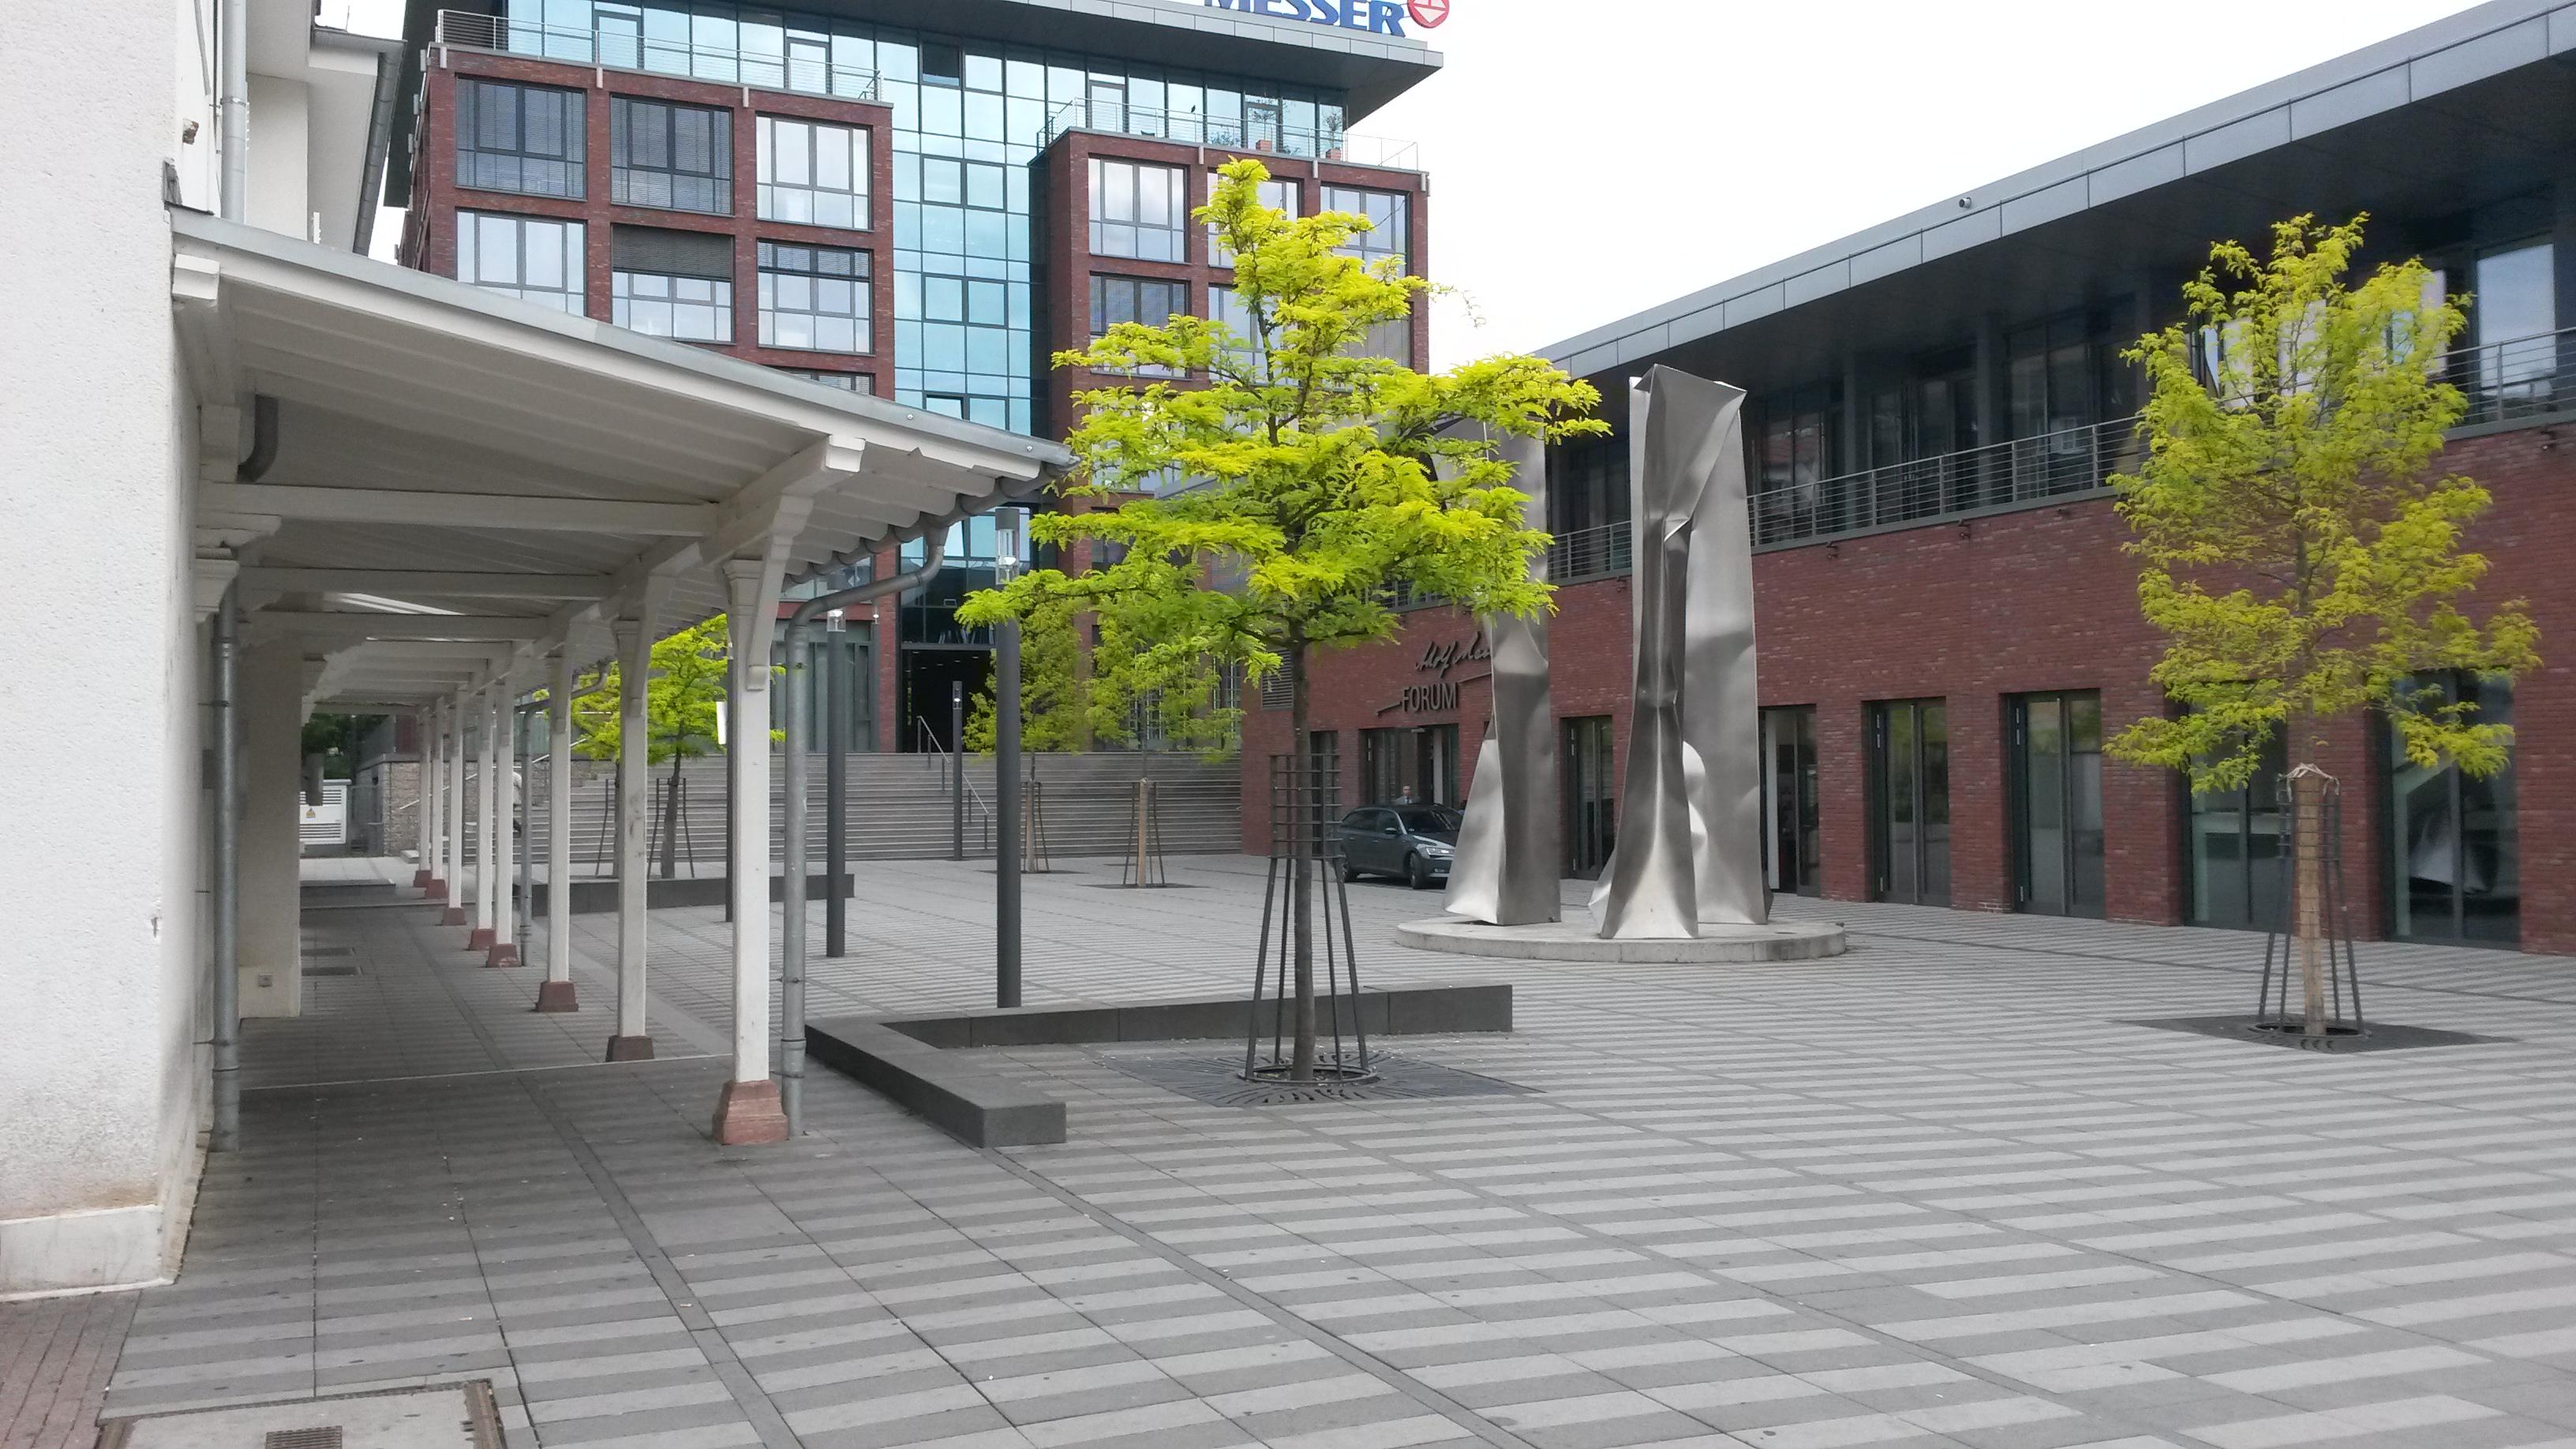 Bahnhof 2018